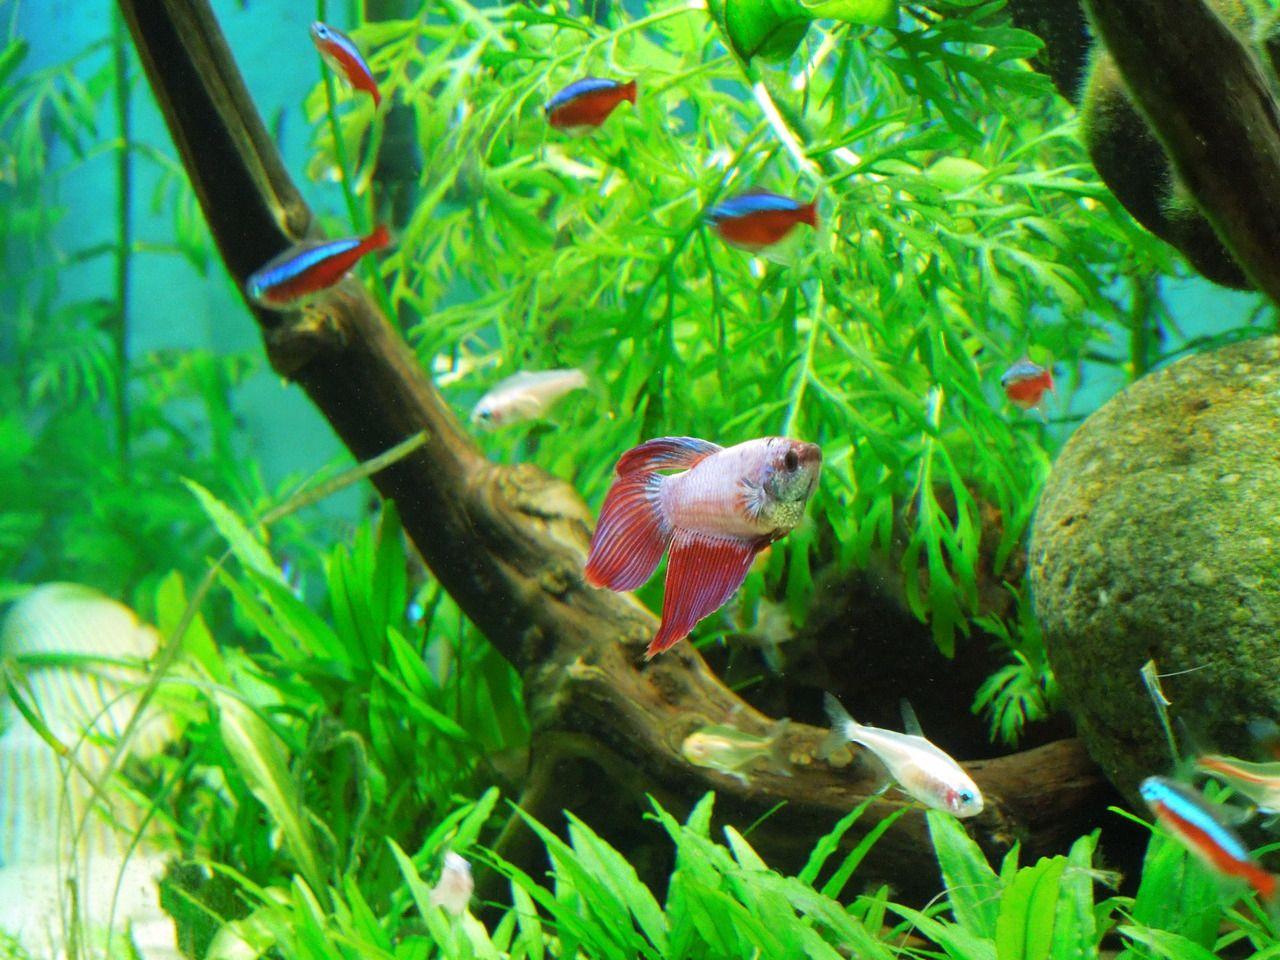 Betta Fish Tank Setup Ideas That Make A Statement! | Fish ...